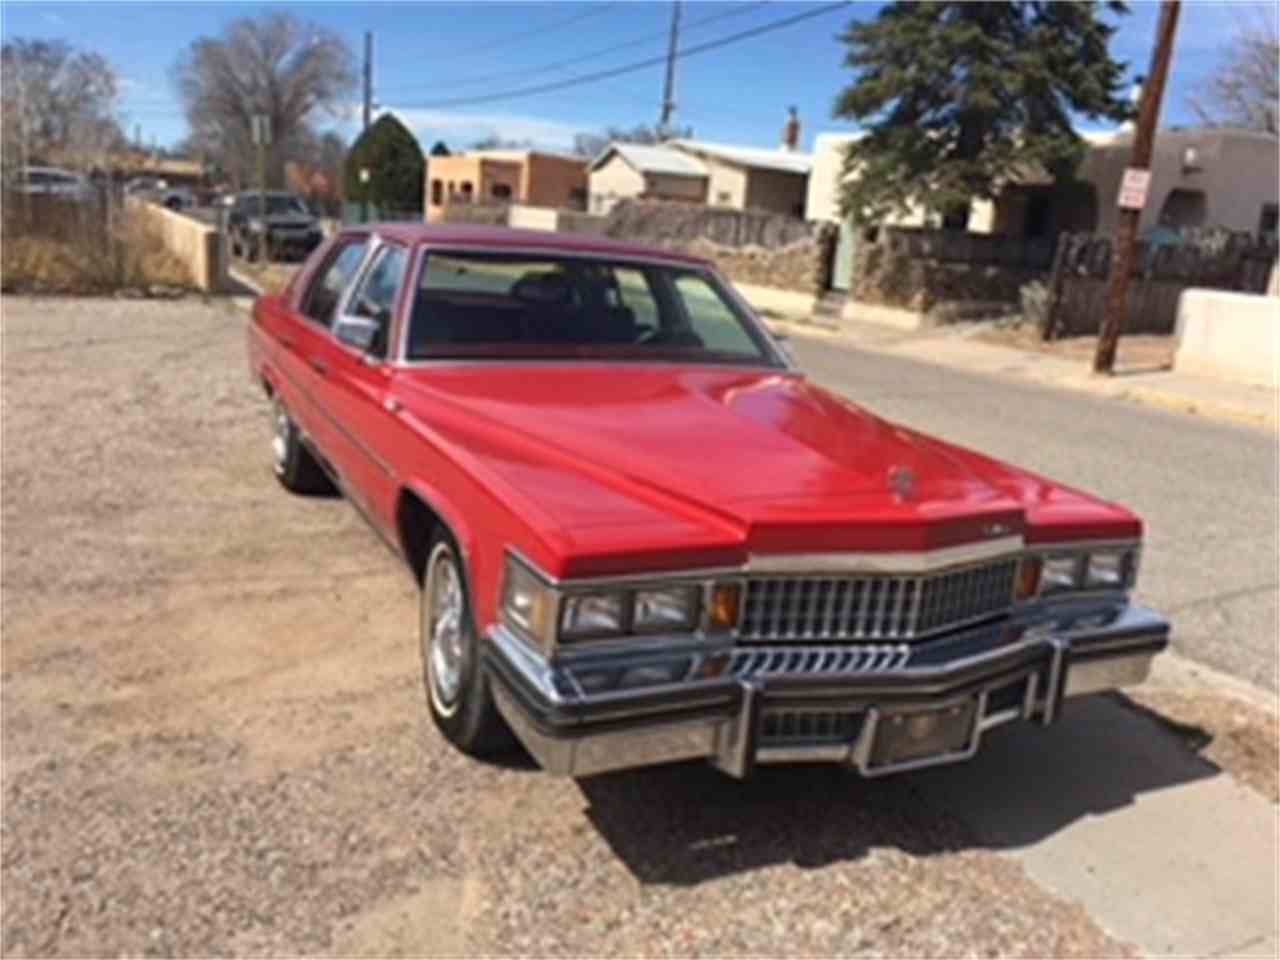 Santa Fe New Mexico Craigslist Cars